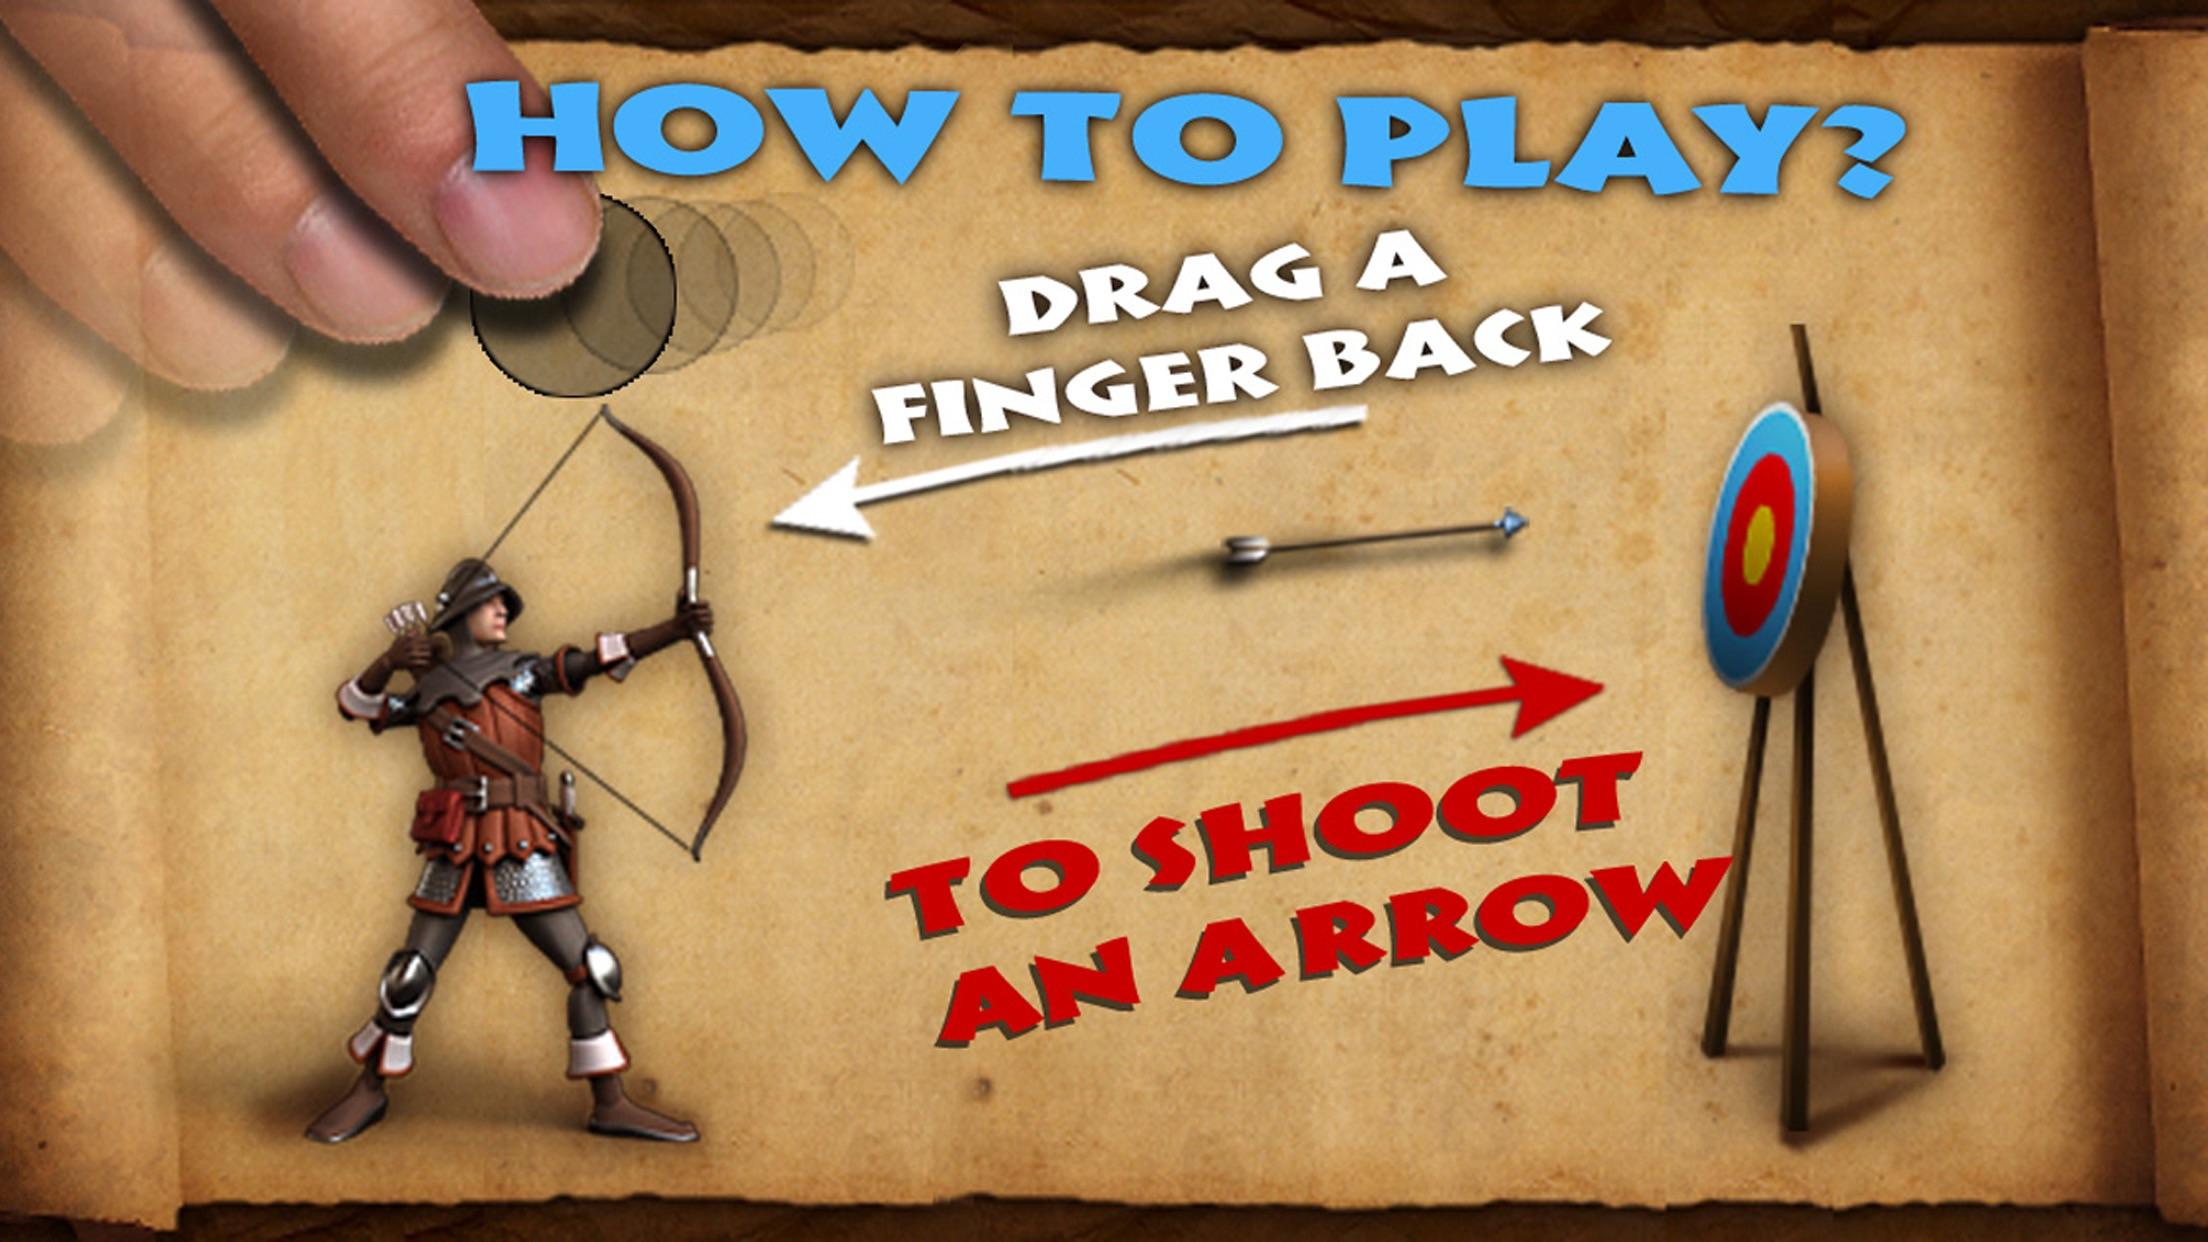 Bowman - bow and arrow games Screenshot